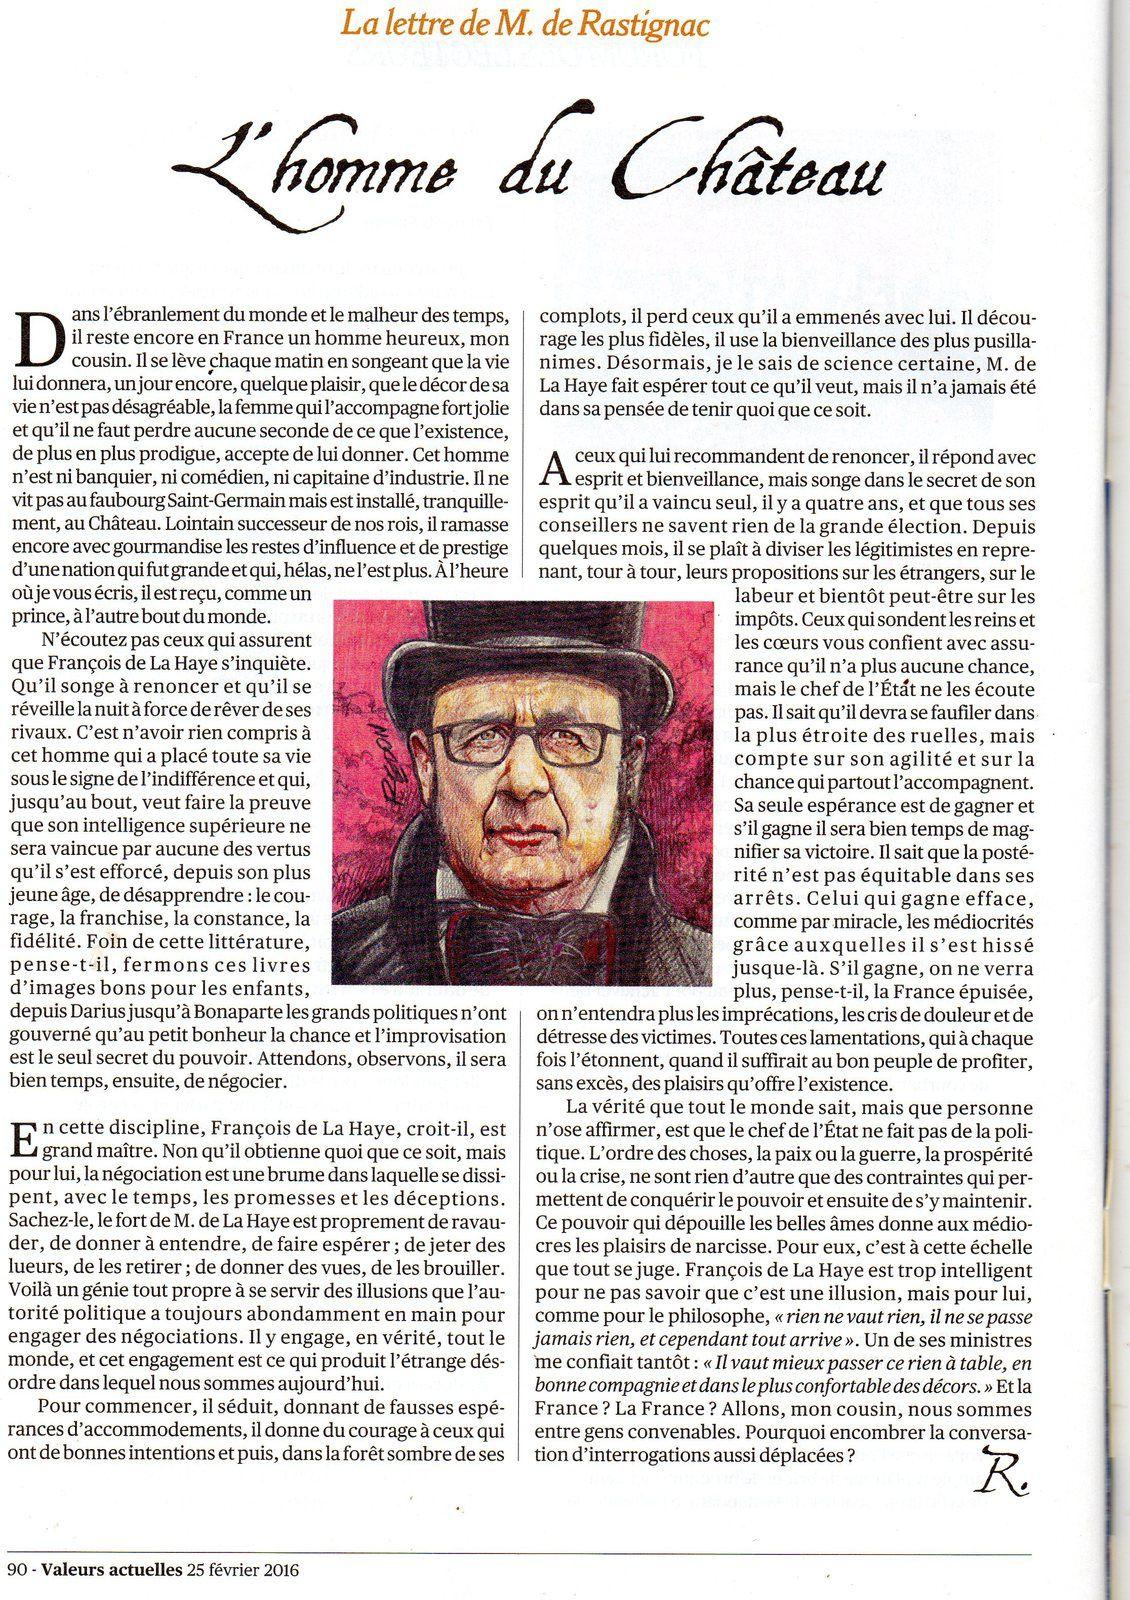 Analyse spectrale de François Hollande, par Rastignac